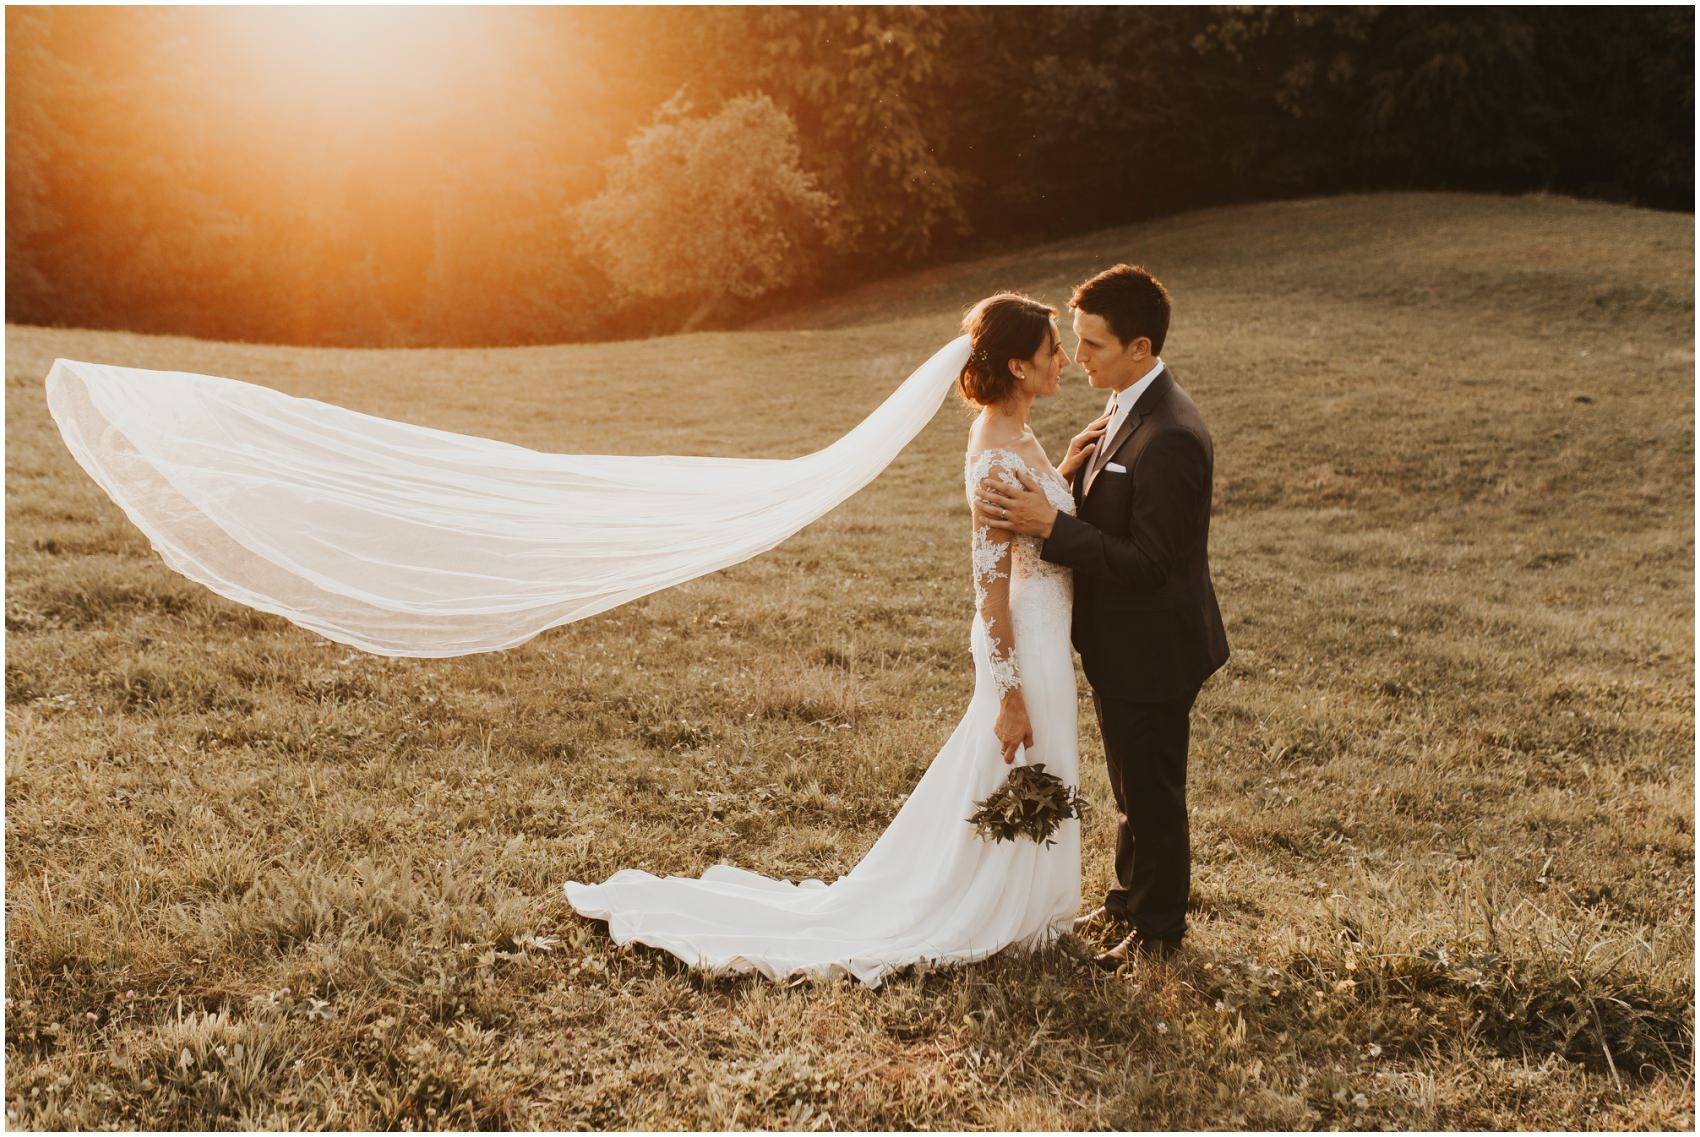 After Wedding Golden Hour Photo Shoot Photography Weddingposes Weddingphotography Goldenh Wedding Shoot Elopement Photography Wedding Couples Photography